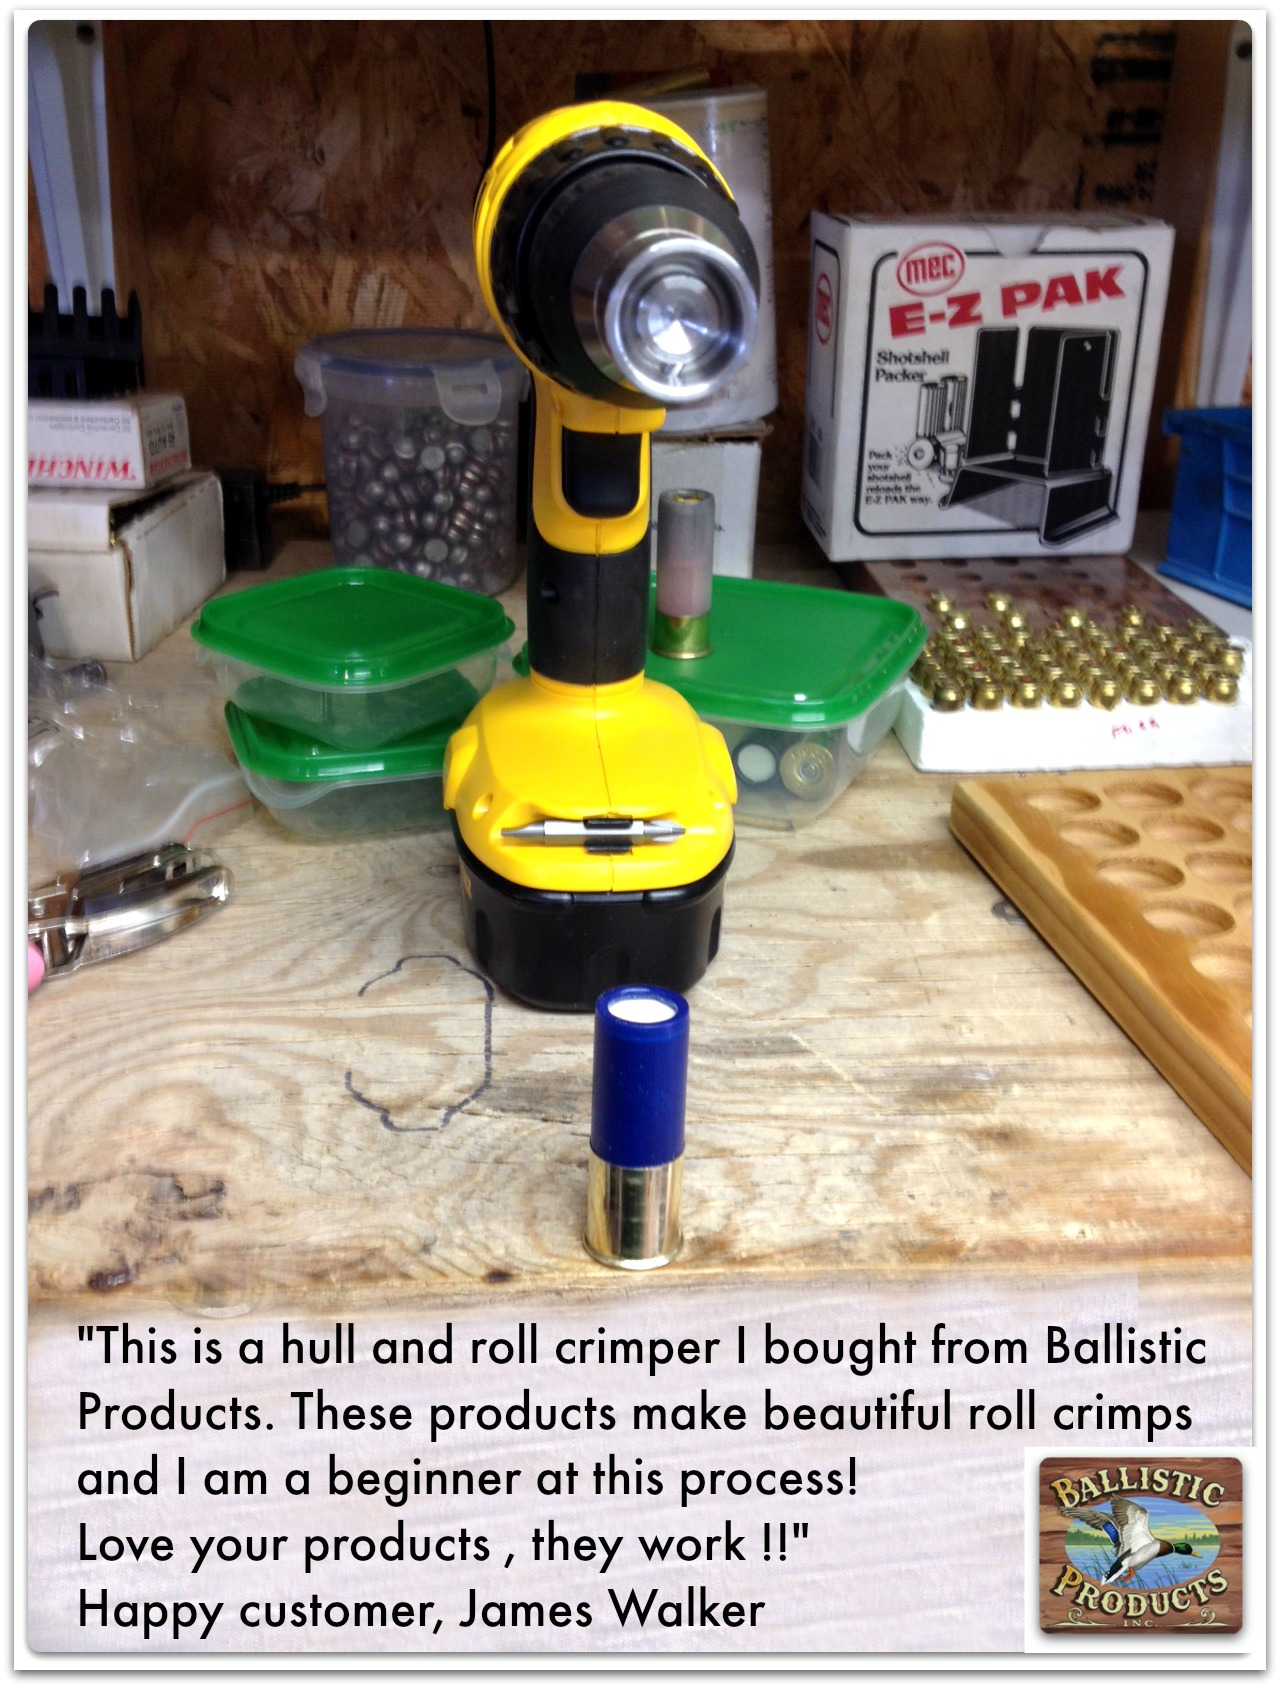 Original Roll Crimping Tool: 8 ga-ballisticproducts com